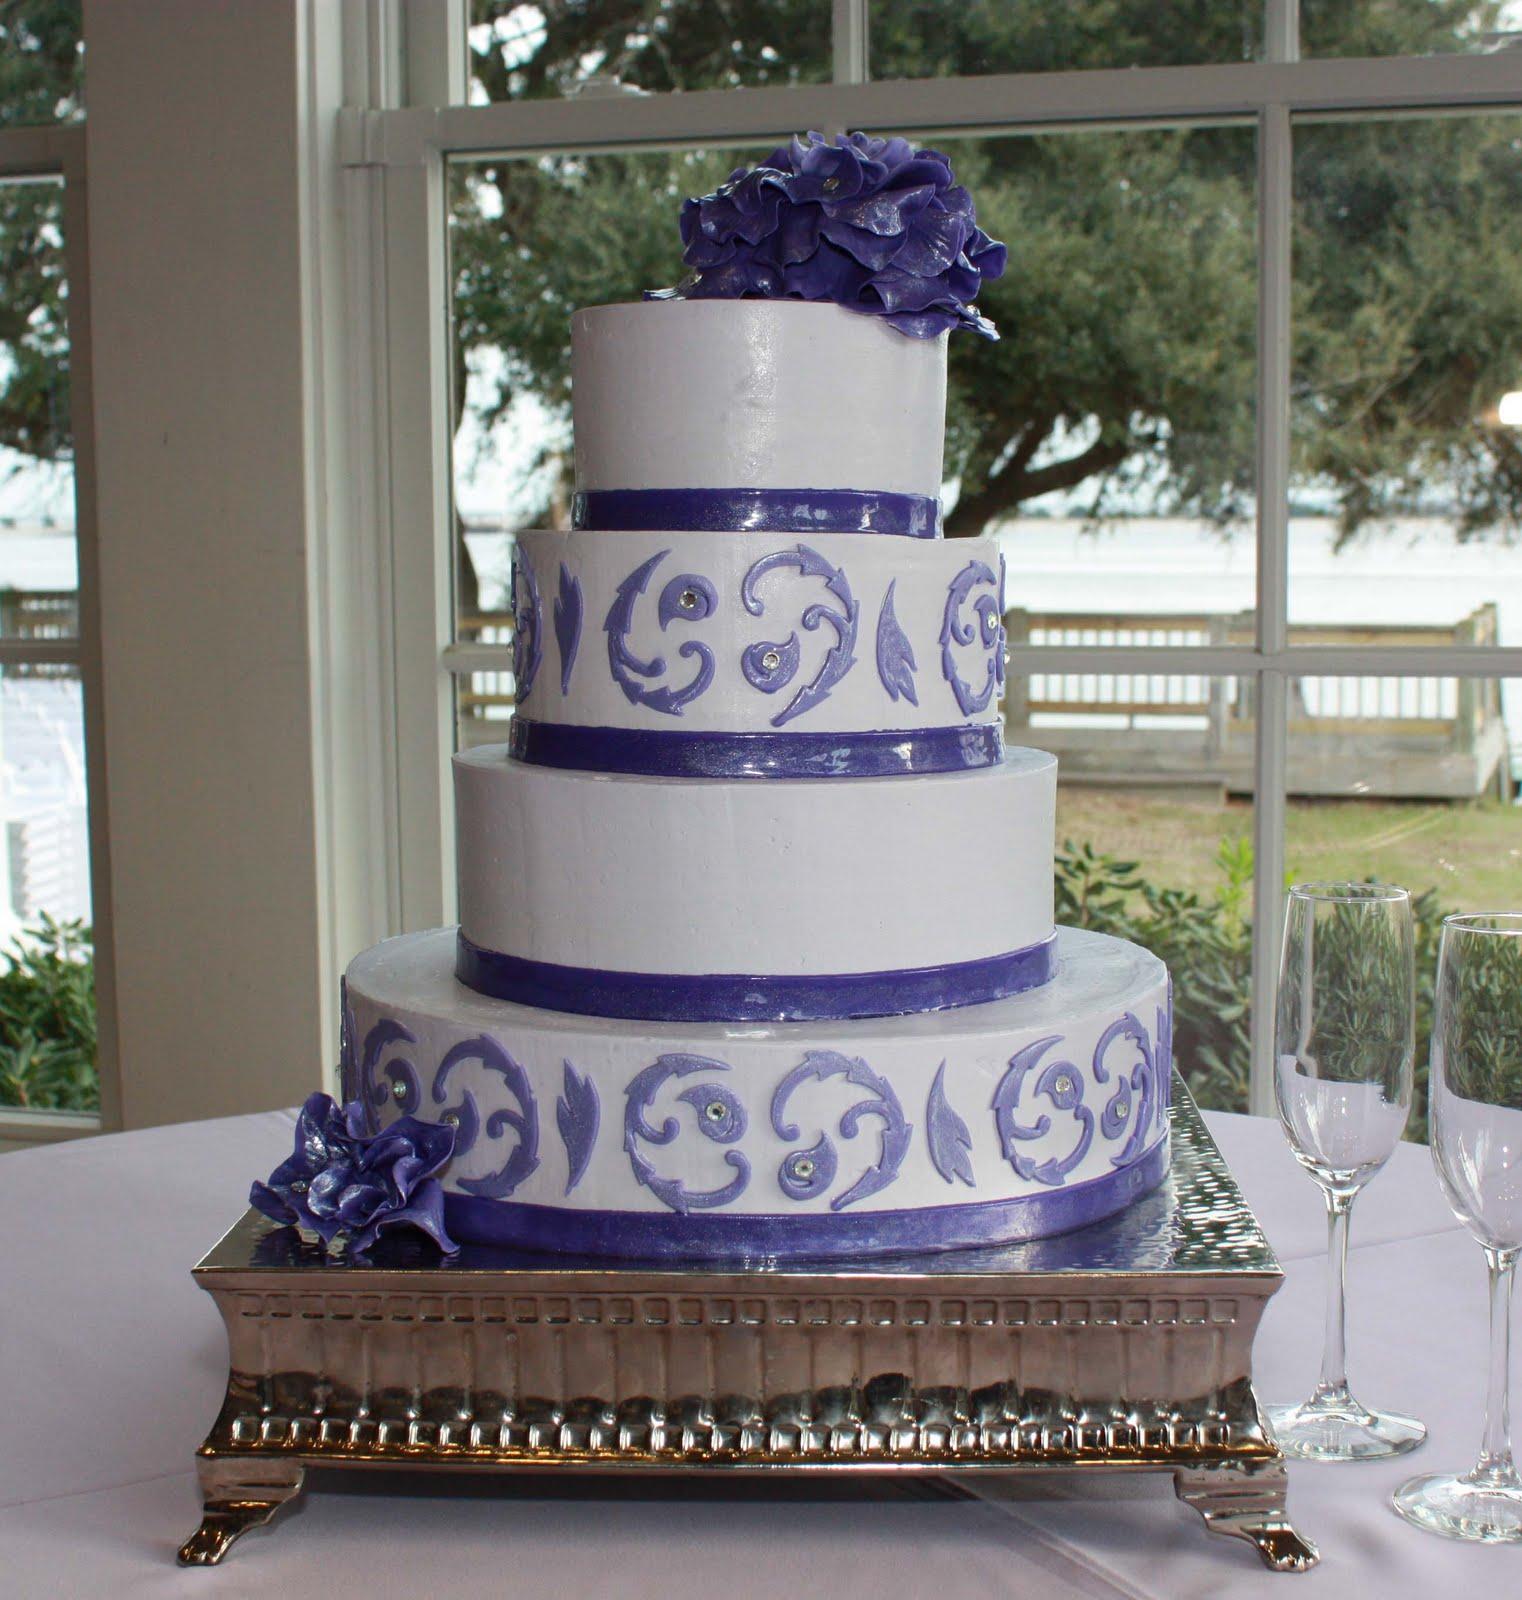 Racchi s blog purple and white wedding cakes